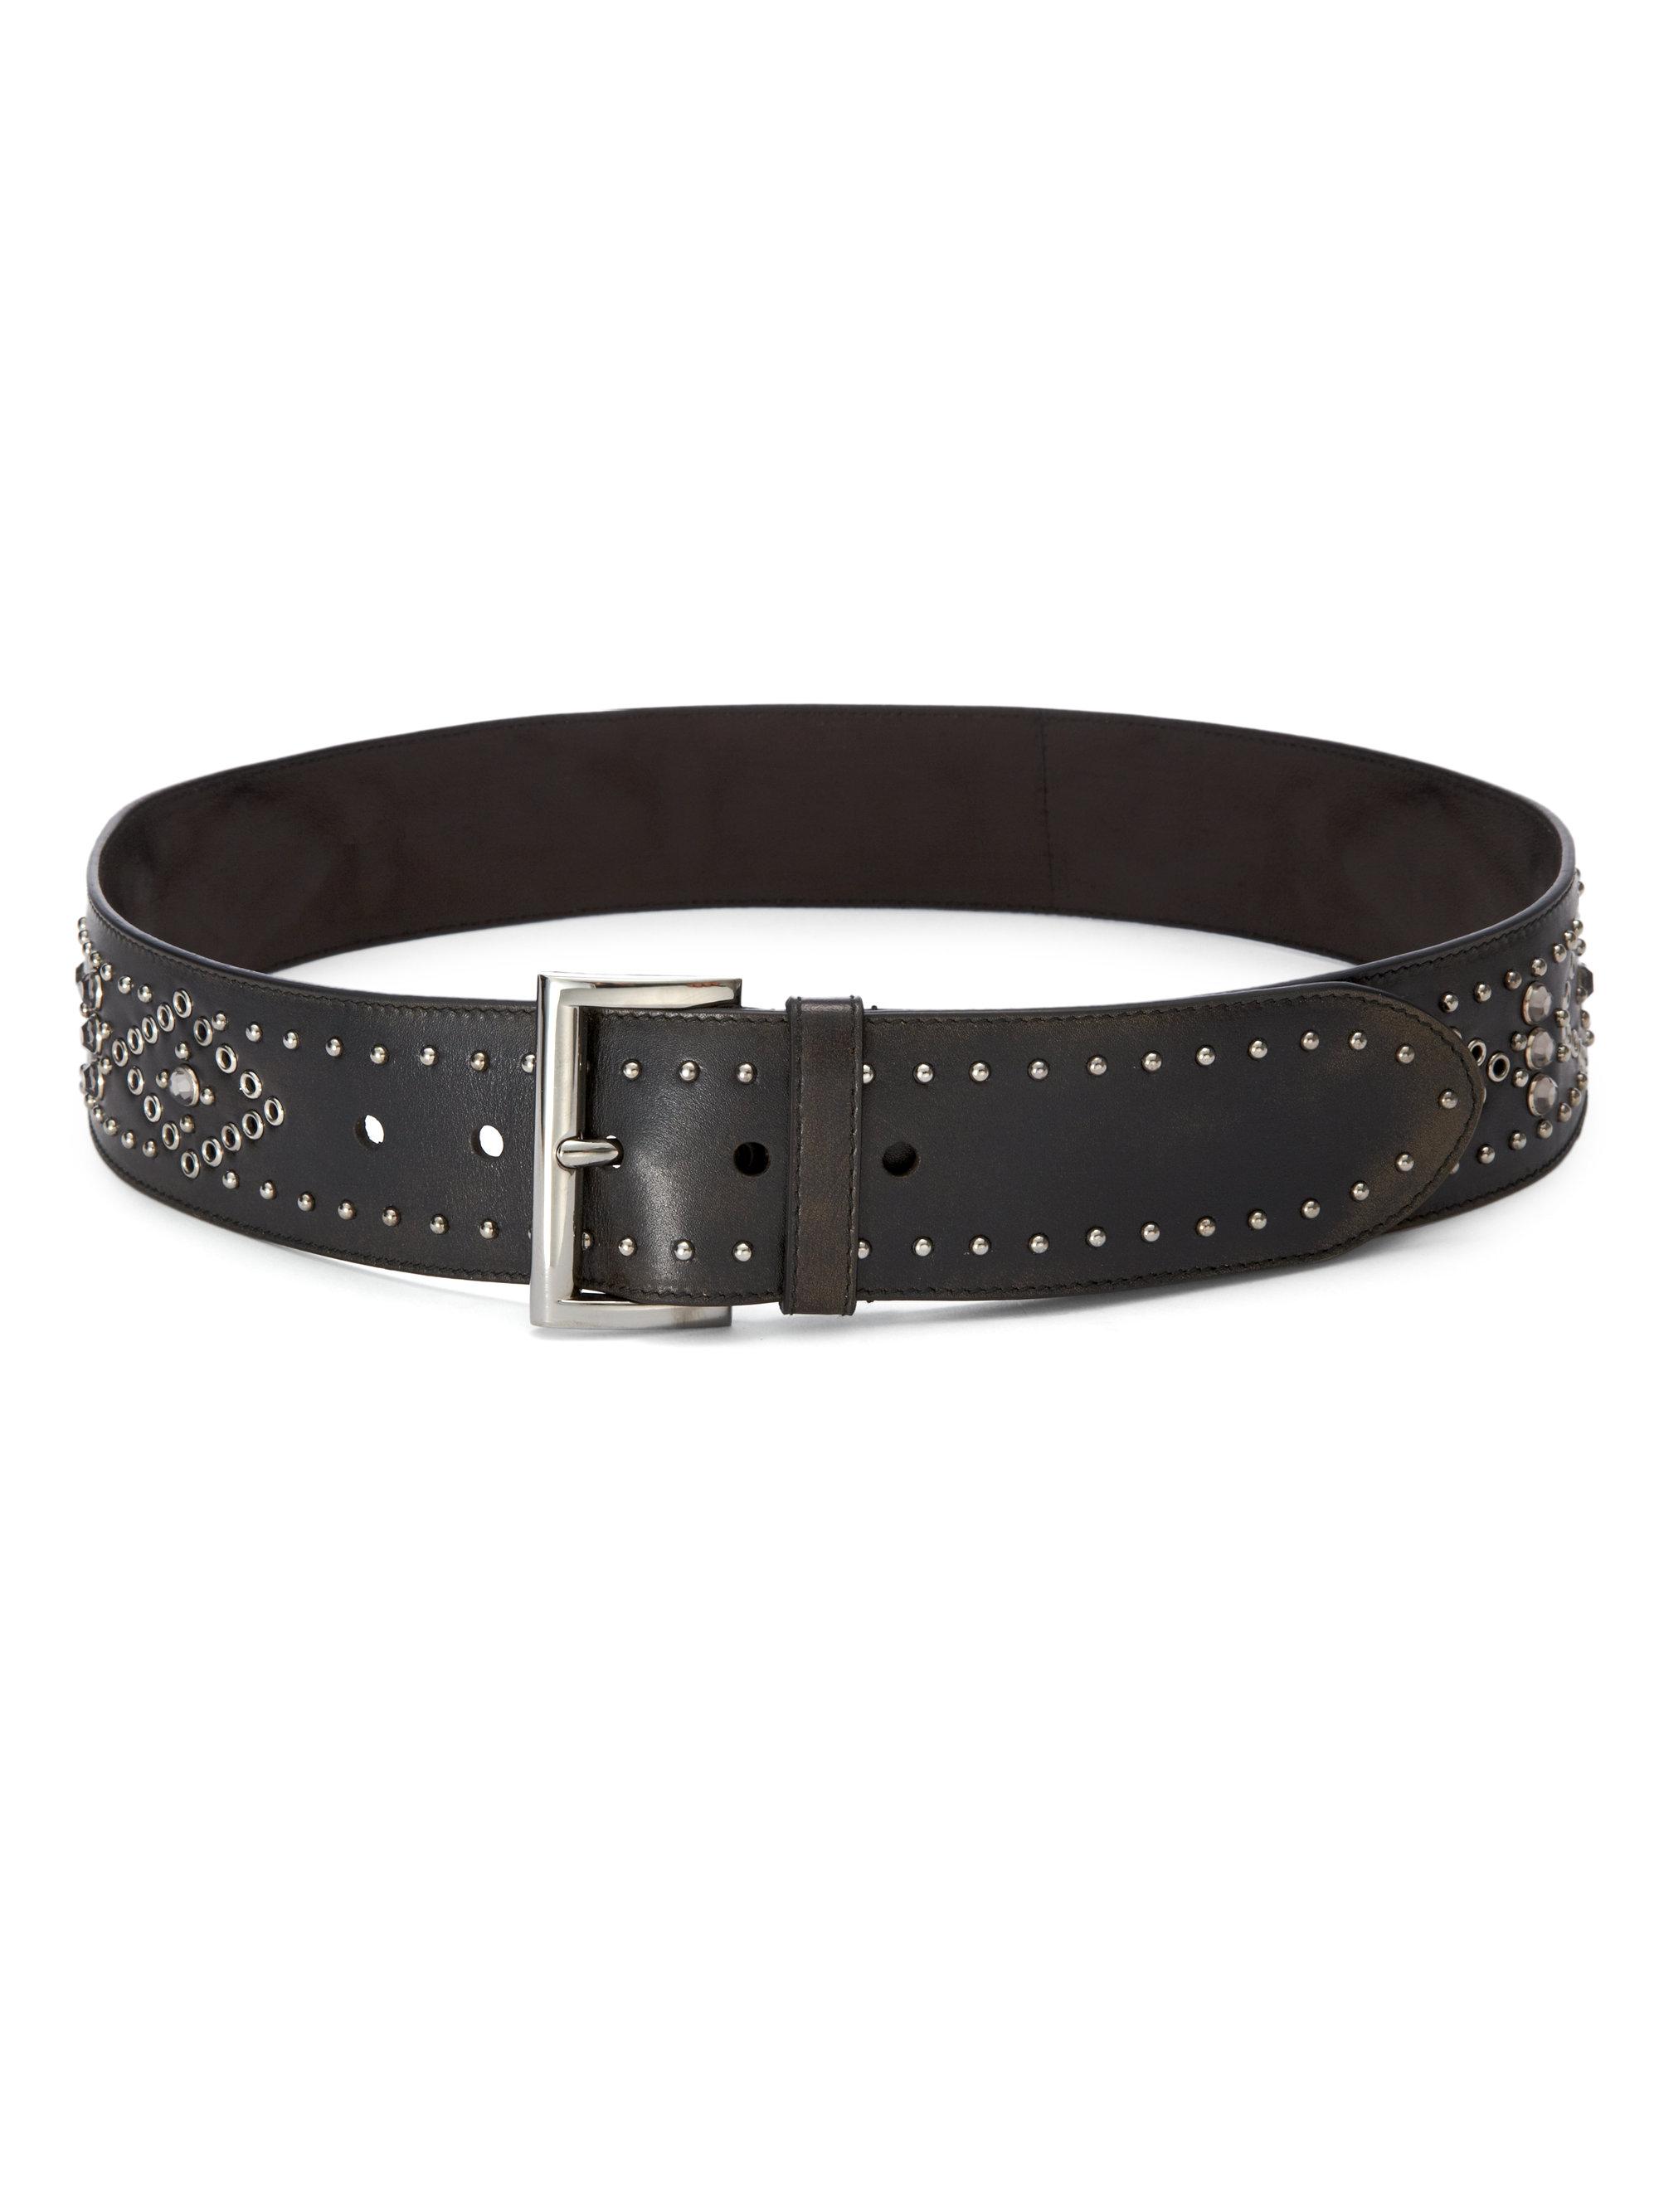 Prada Studded Wide Leather Belt in Black | Lyst